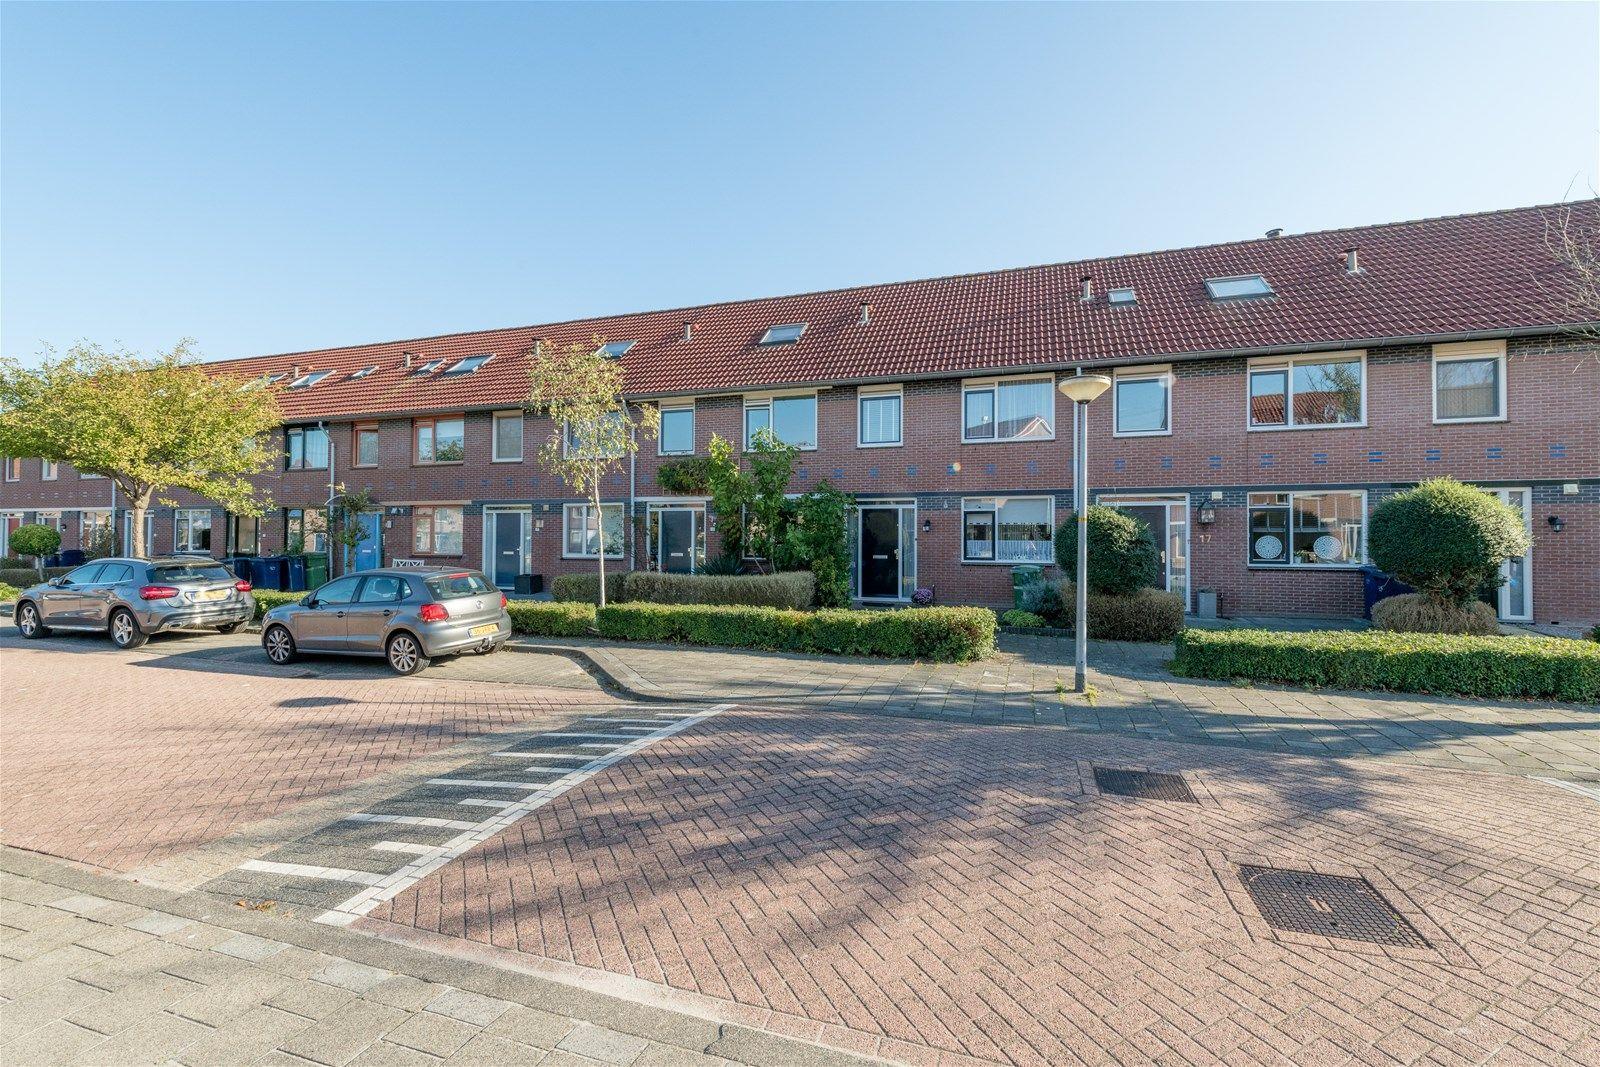 Annie Bosstraat 13, Almere